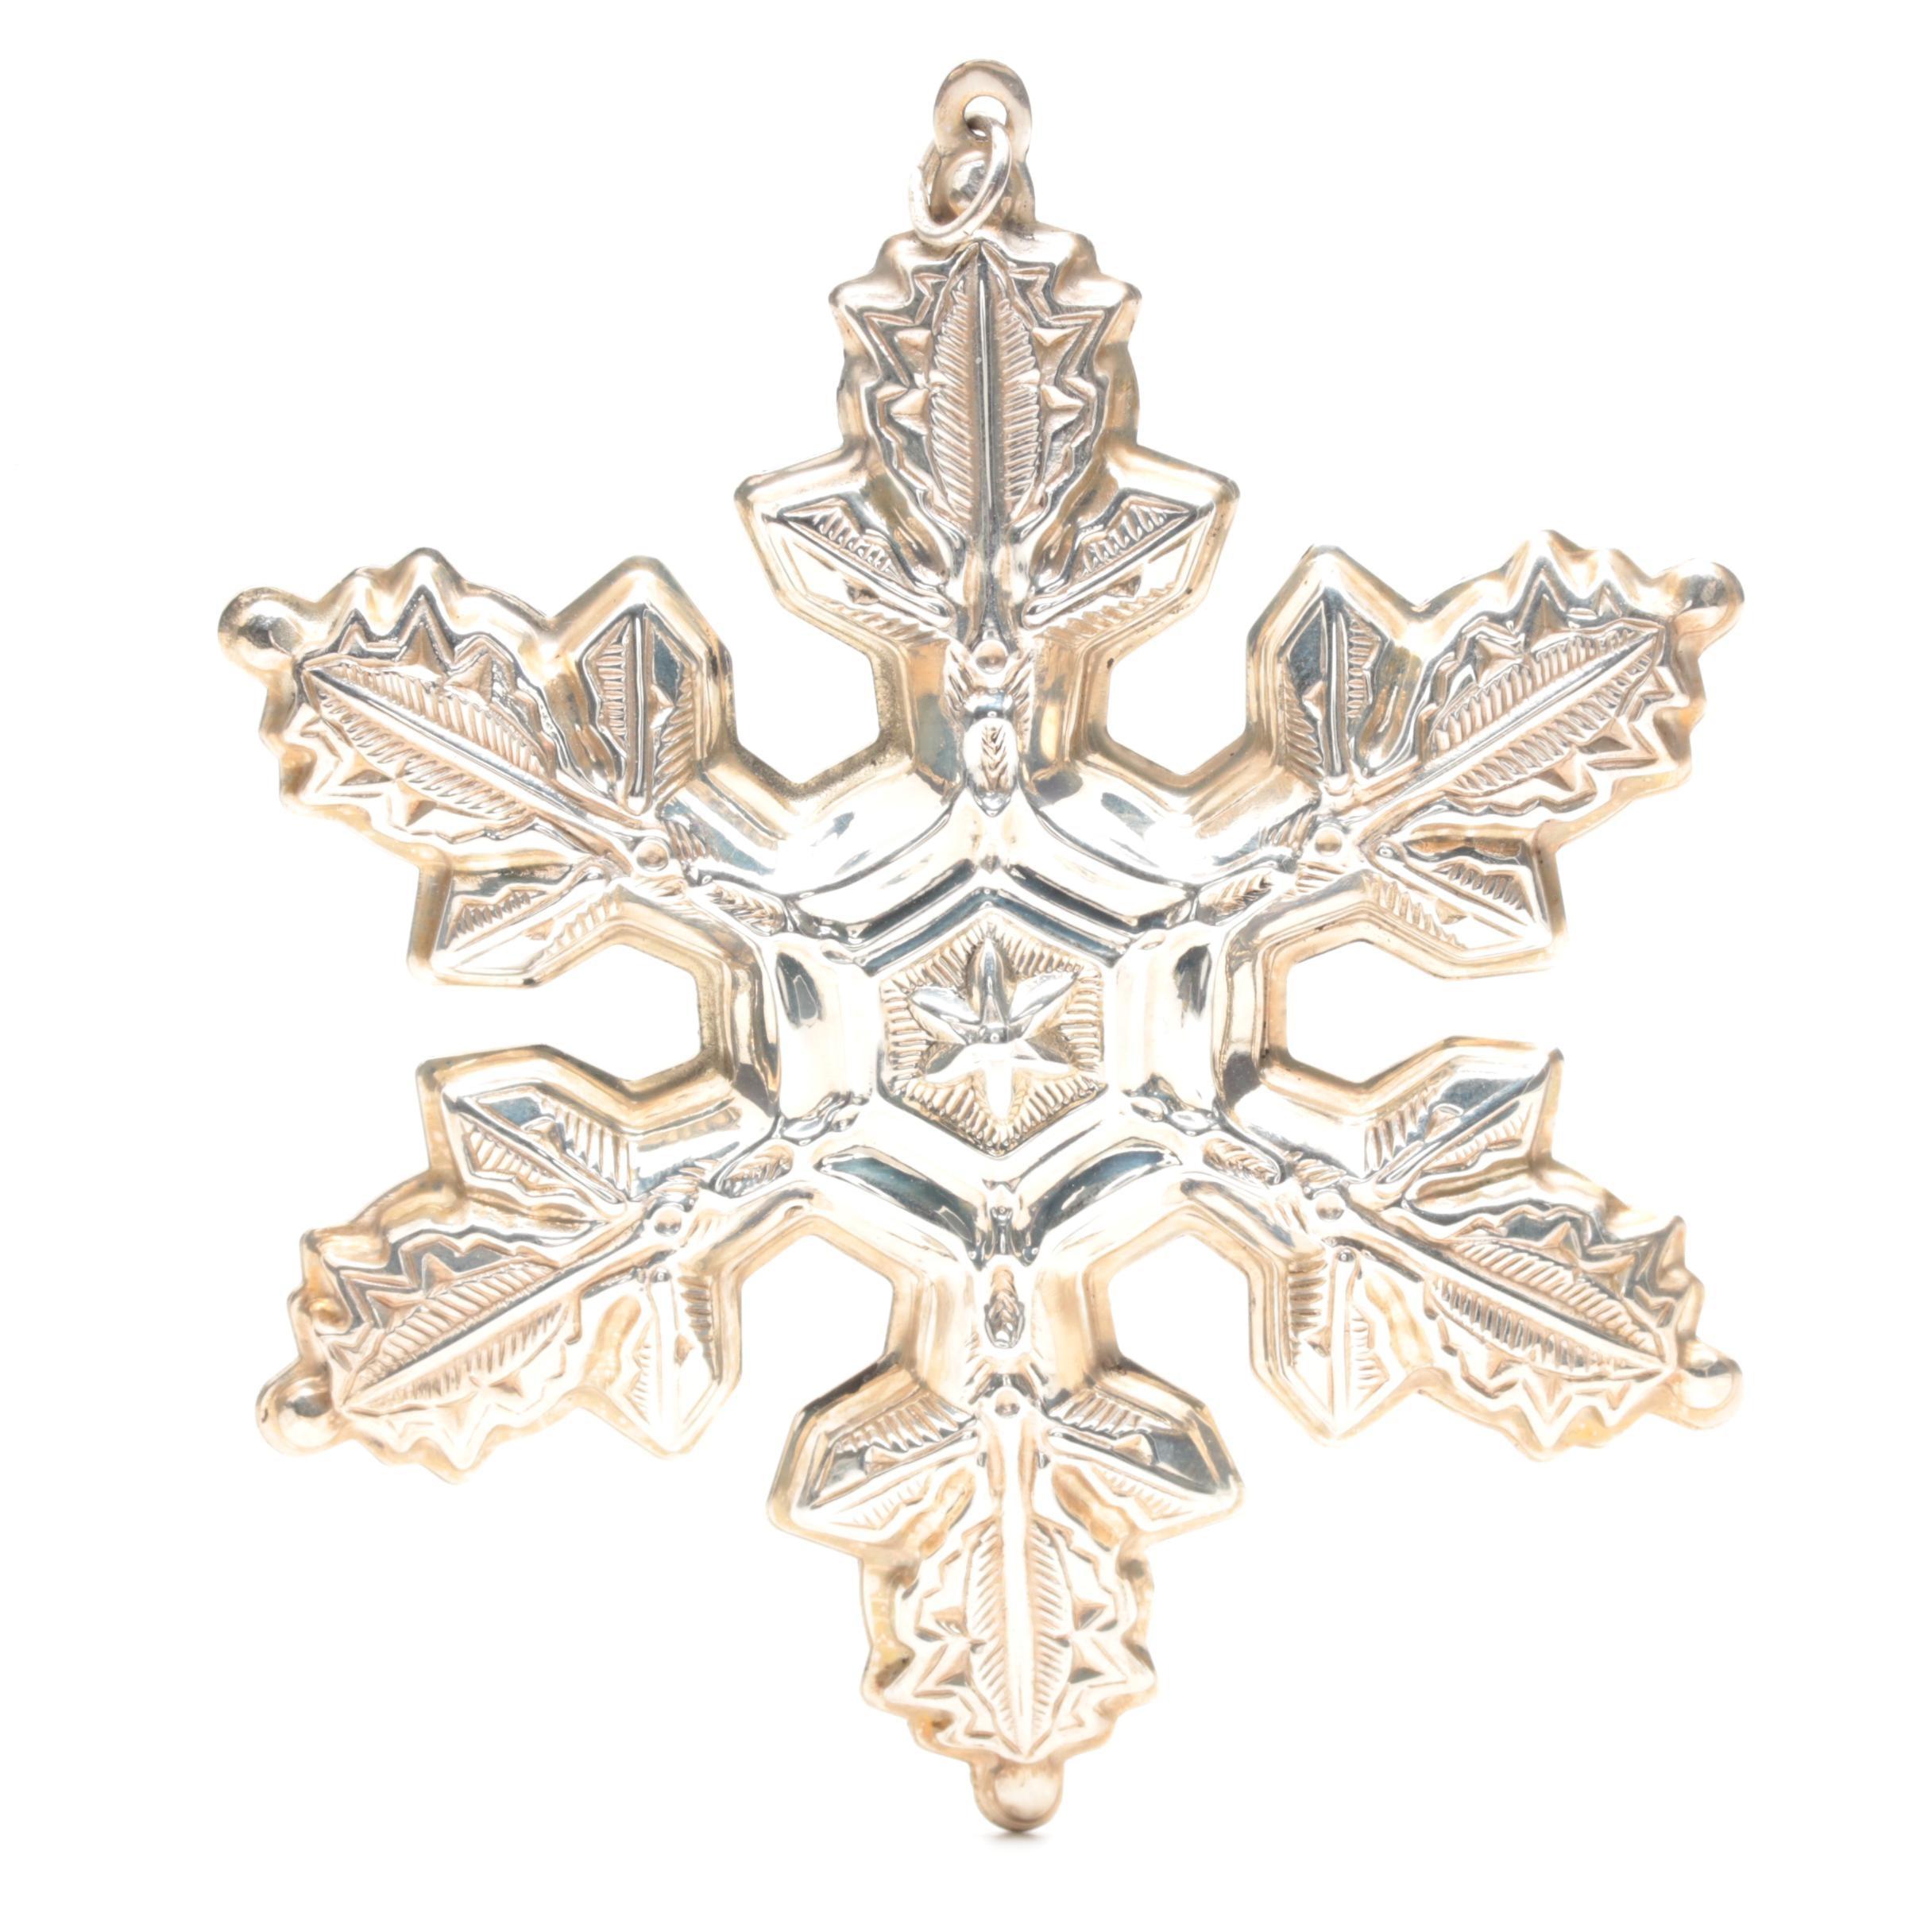 1997 Gorham Sterling Silver Snowflake Ornament